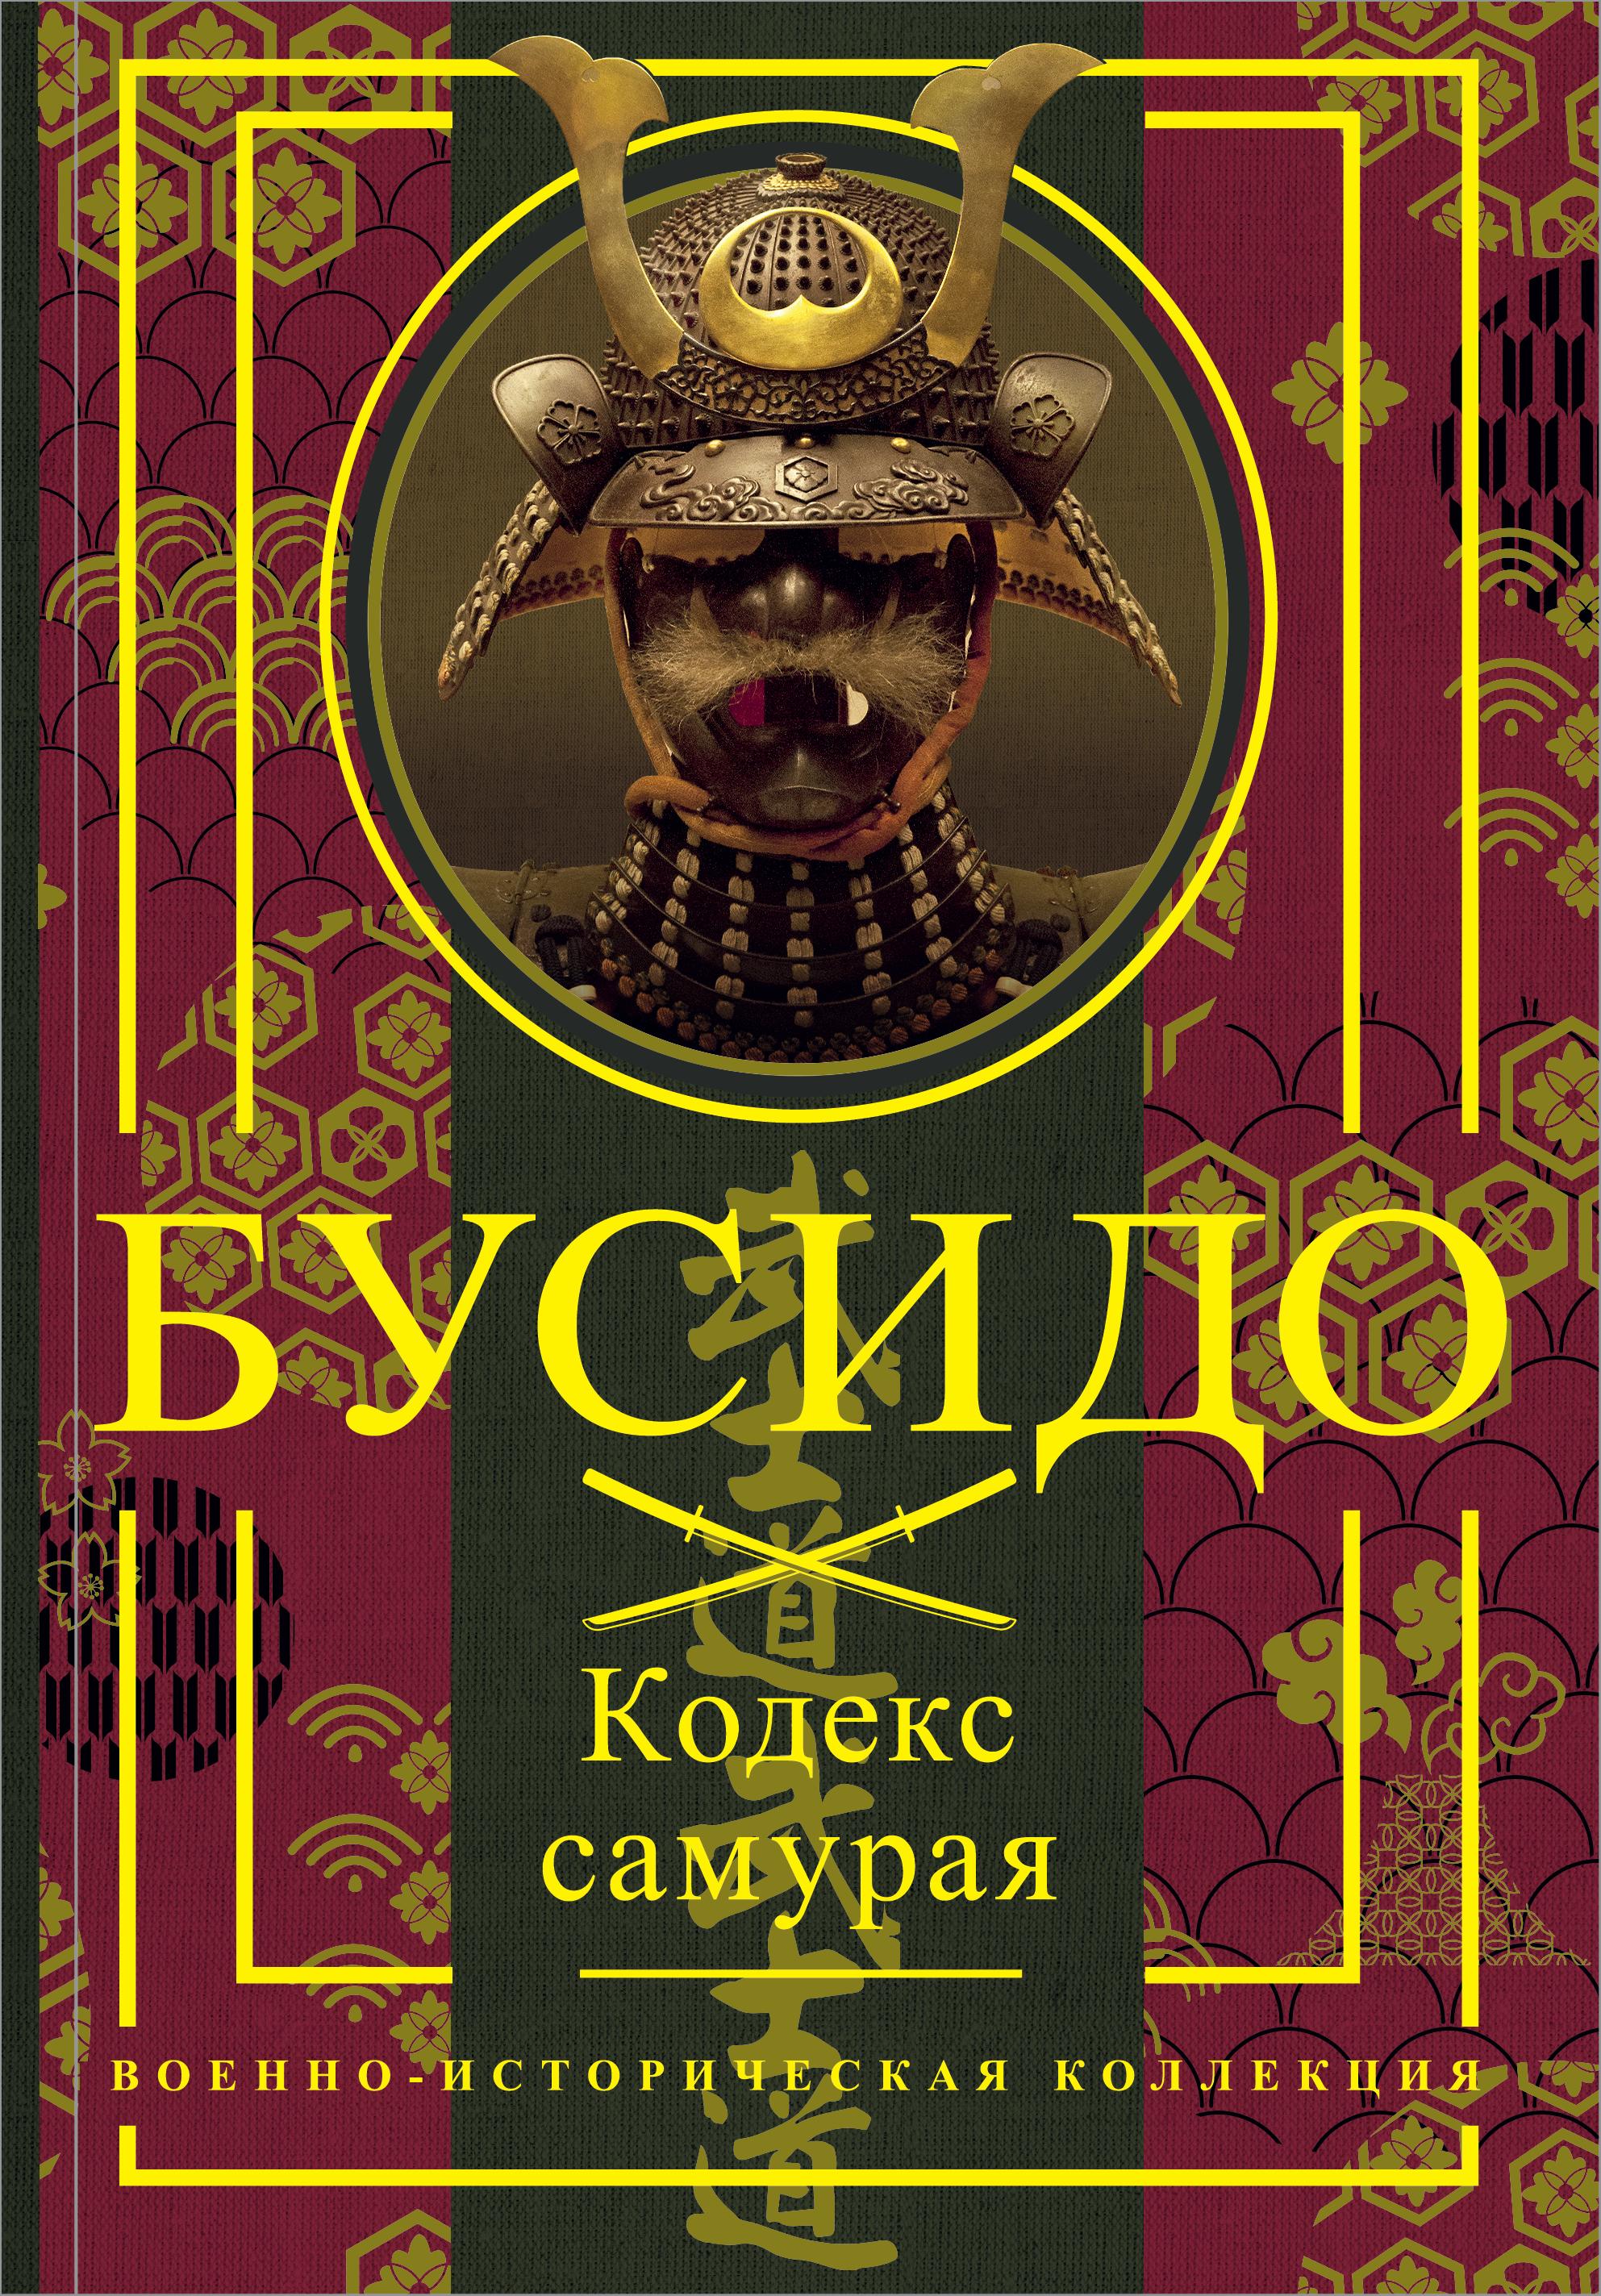 Ямамото Цунэтомо Бусидо. Кодекс самурая дайдодзи ю цунэтомо я мусаси м и др бусидо военный канон самурая с комментариями